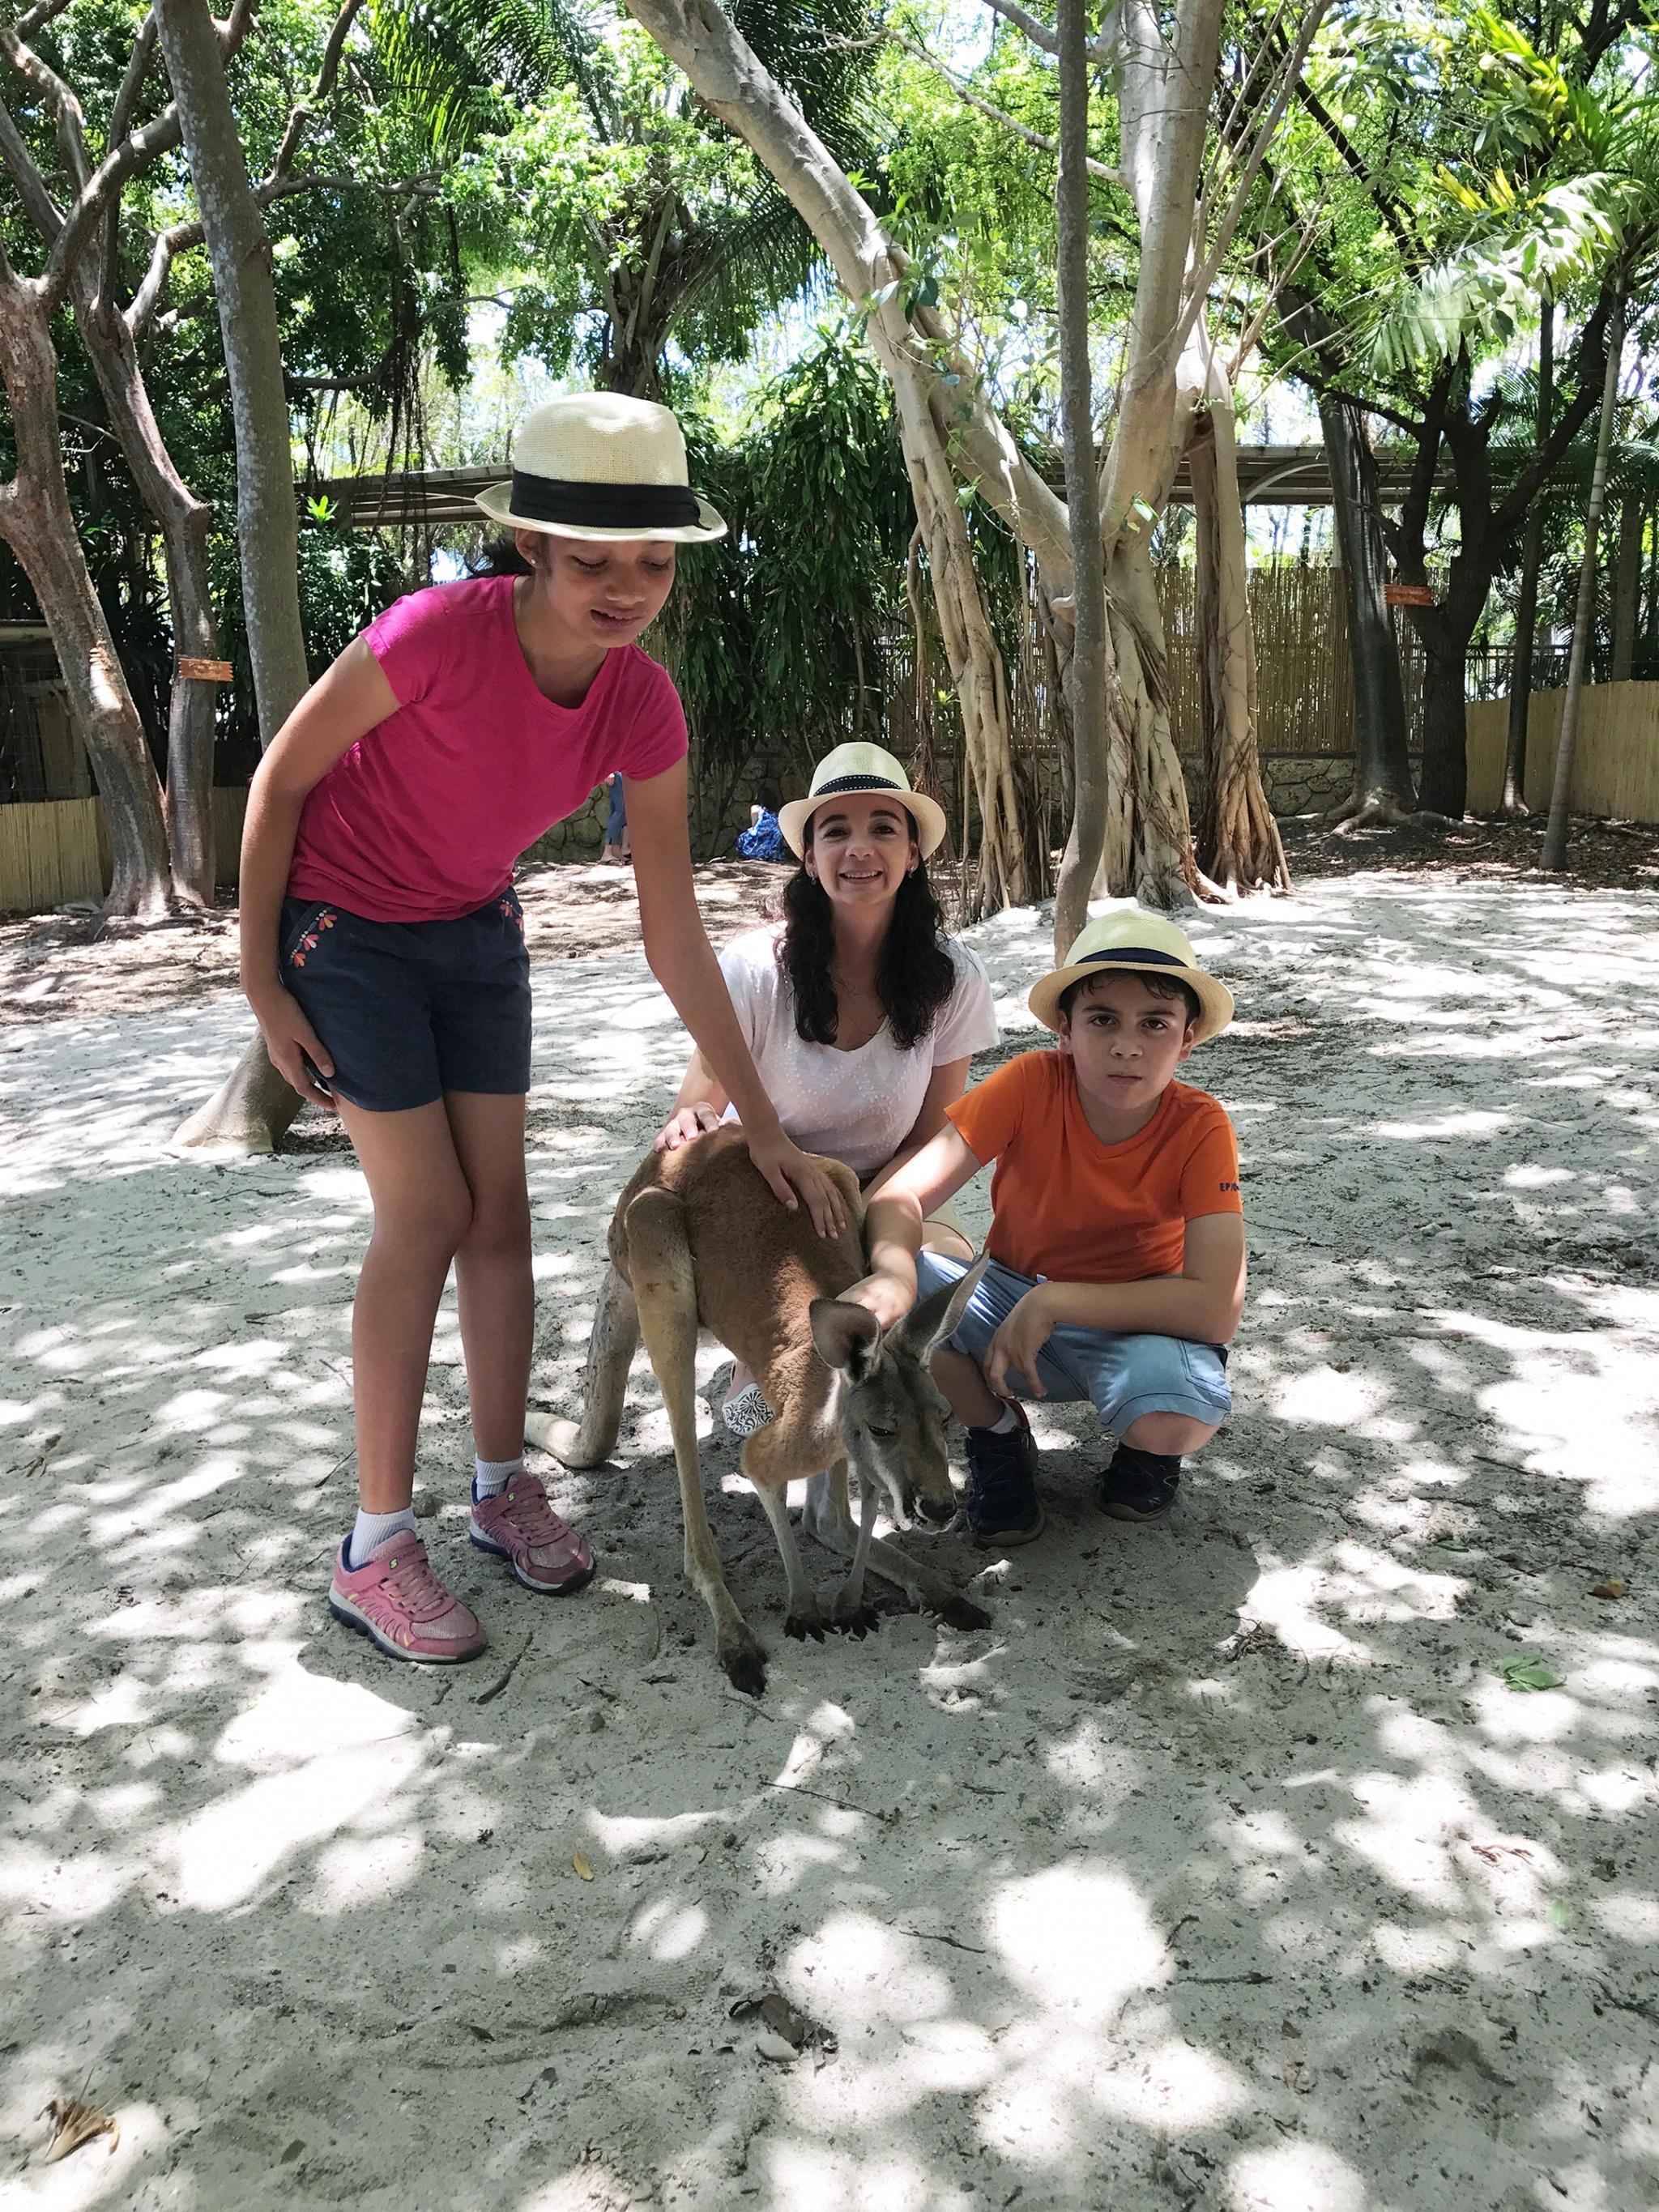 Petting kangaroos at Jungle Island